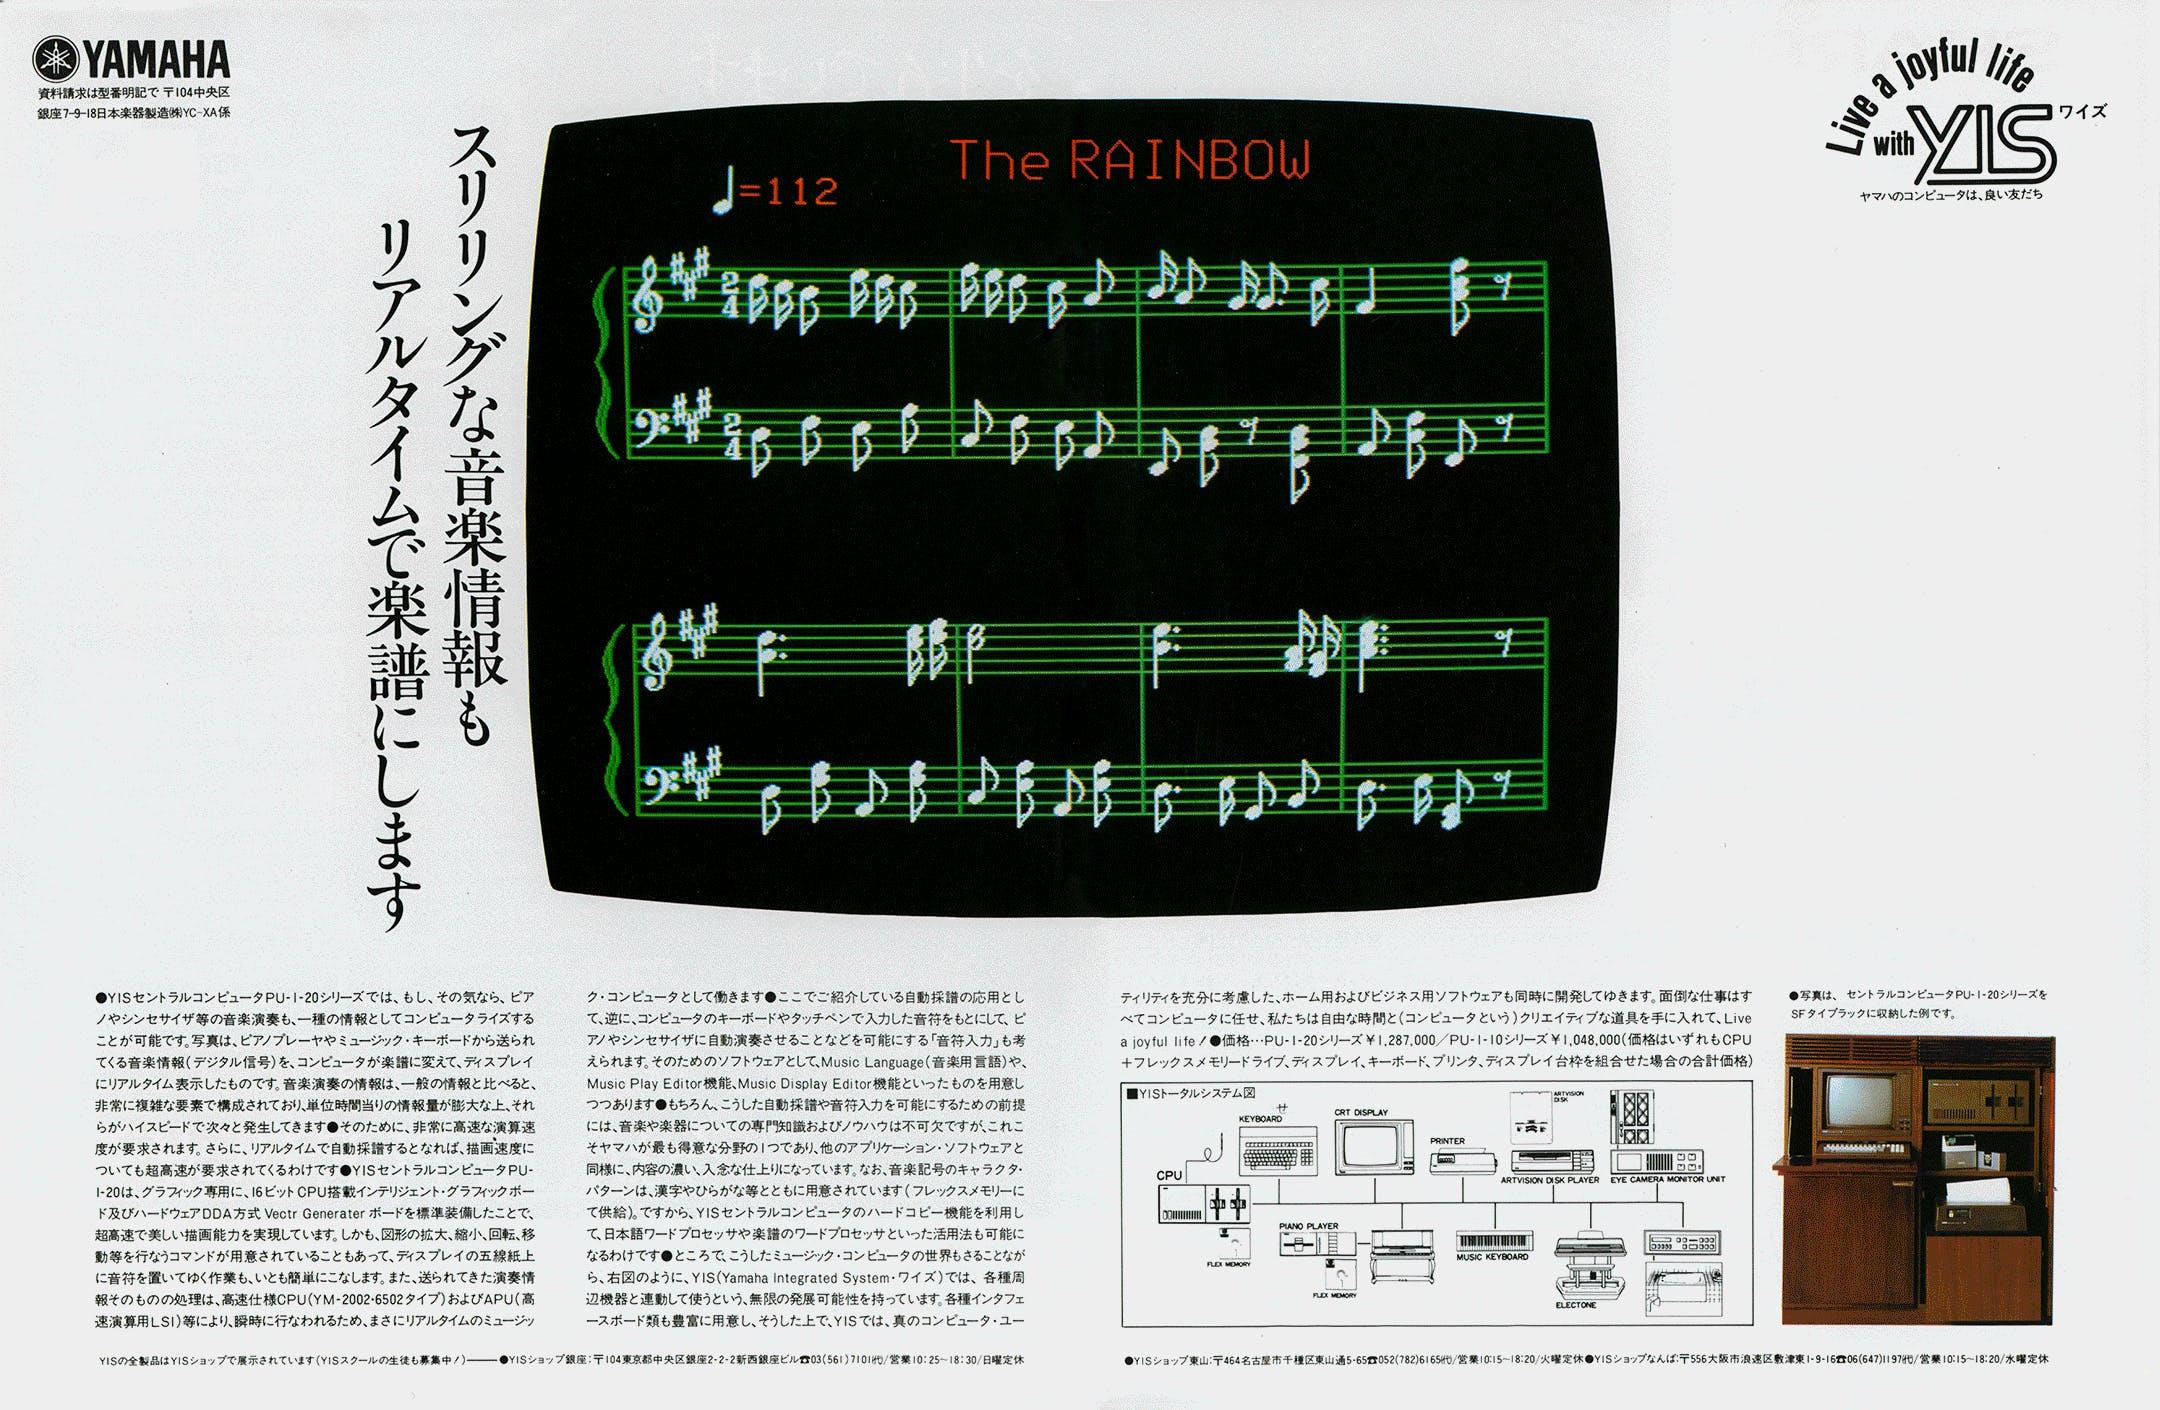 Yamaha YIS advertisement ASCII japan 5 1982